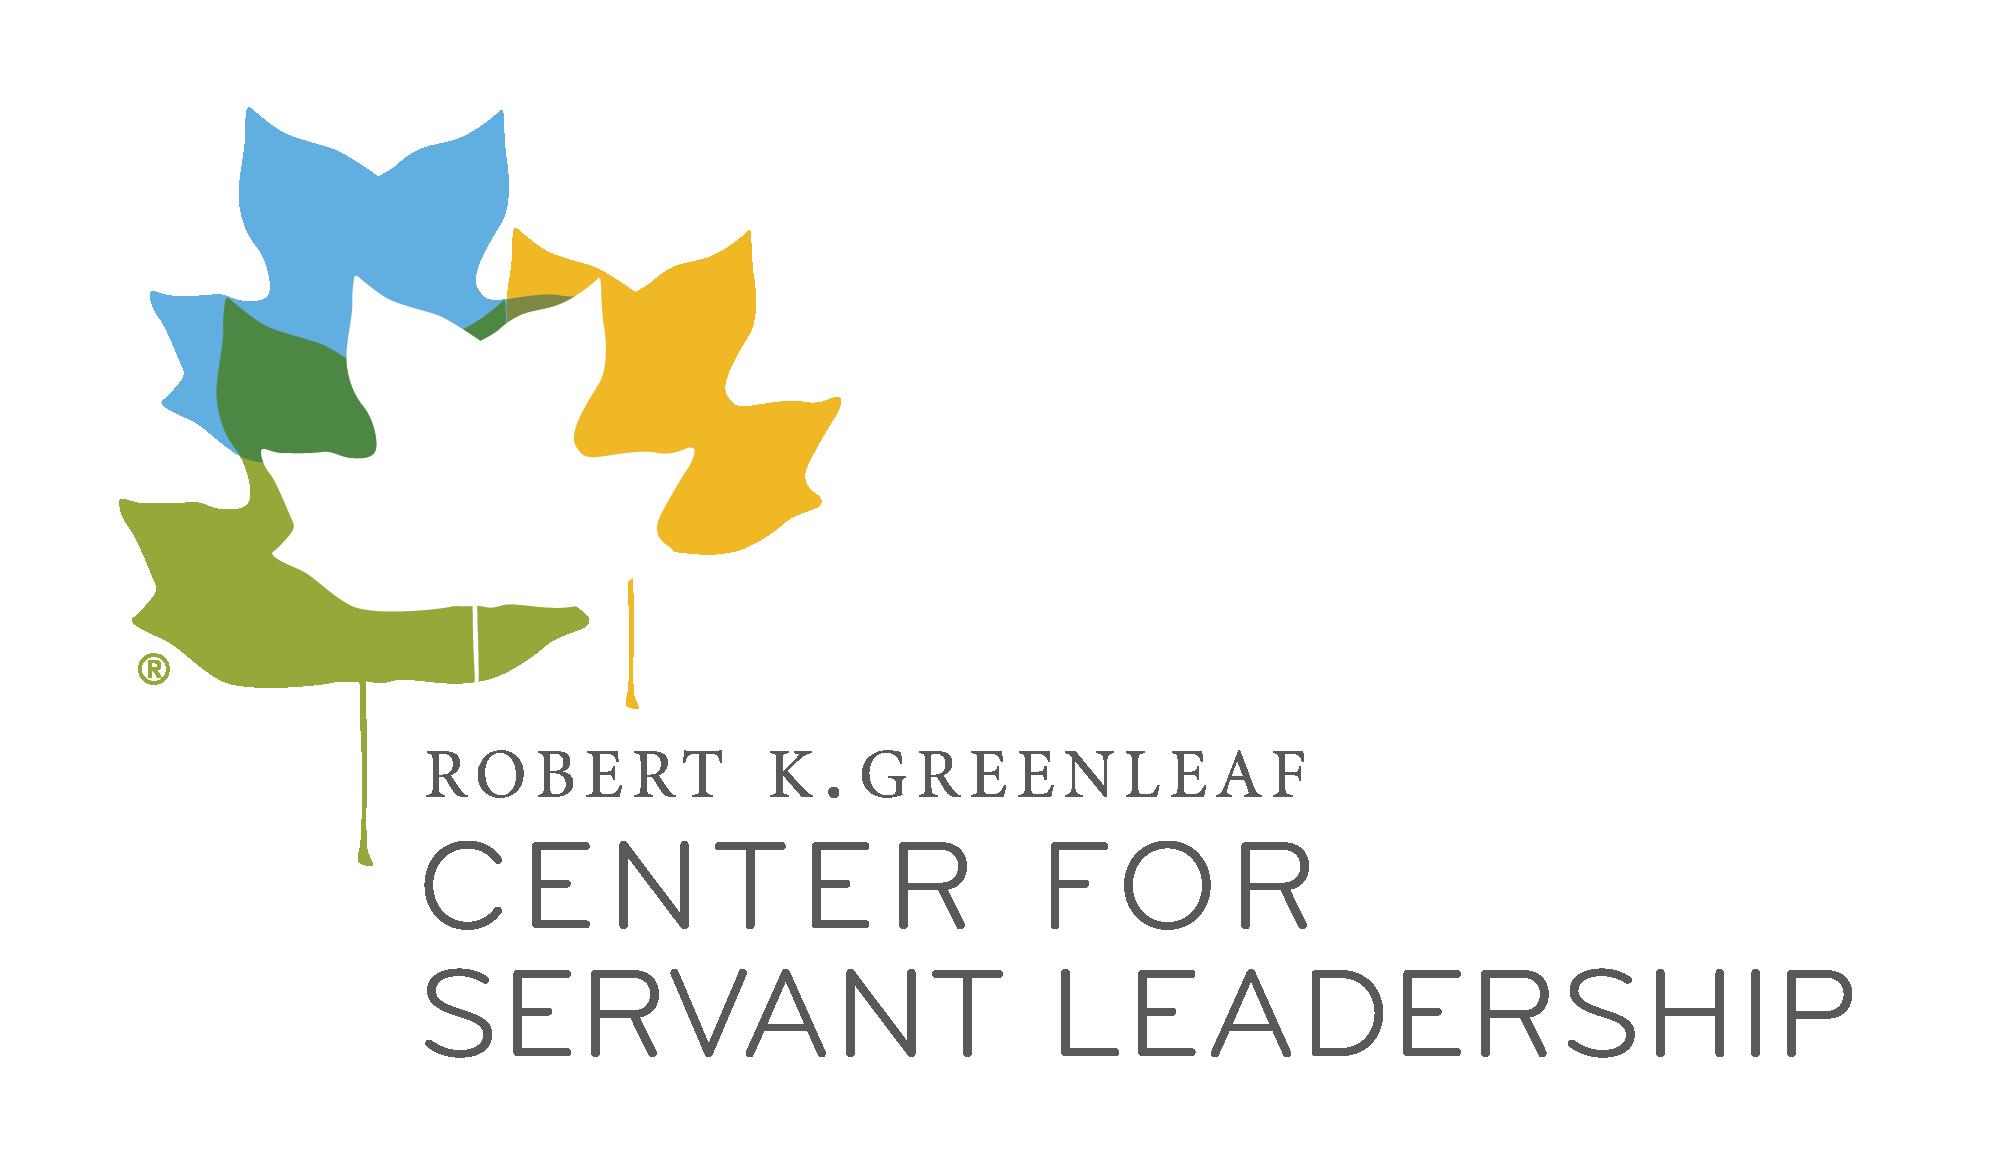 Teamwork clipart servant leadership. Products archive greenleaf center